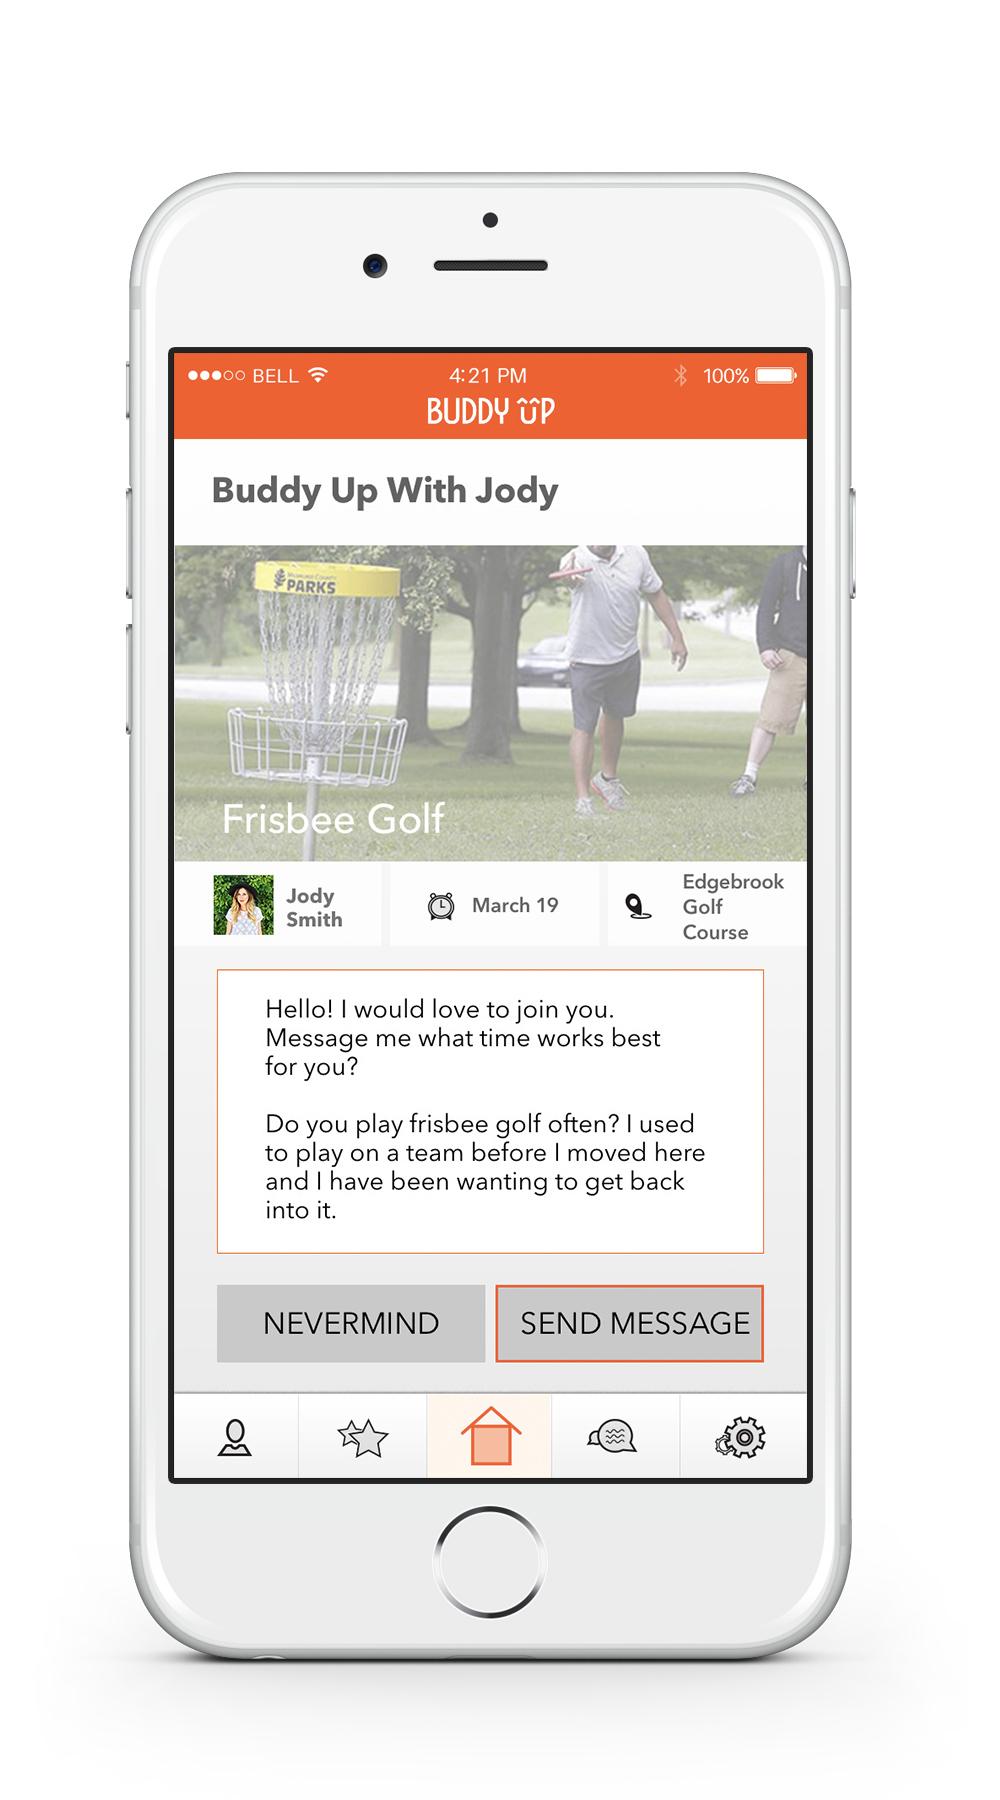 CMee_BuddyUp_UX_9.jpg